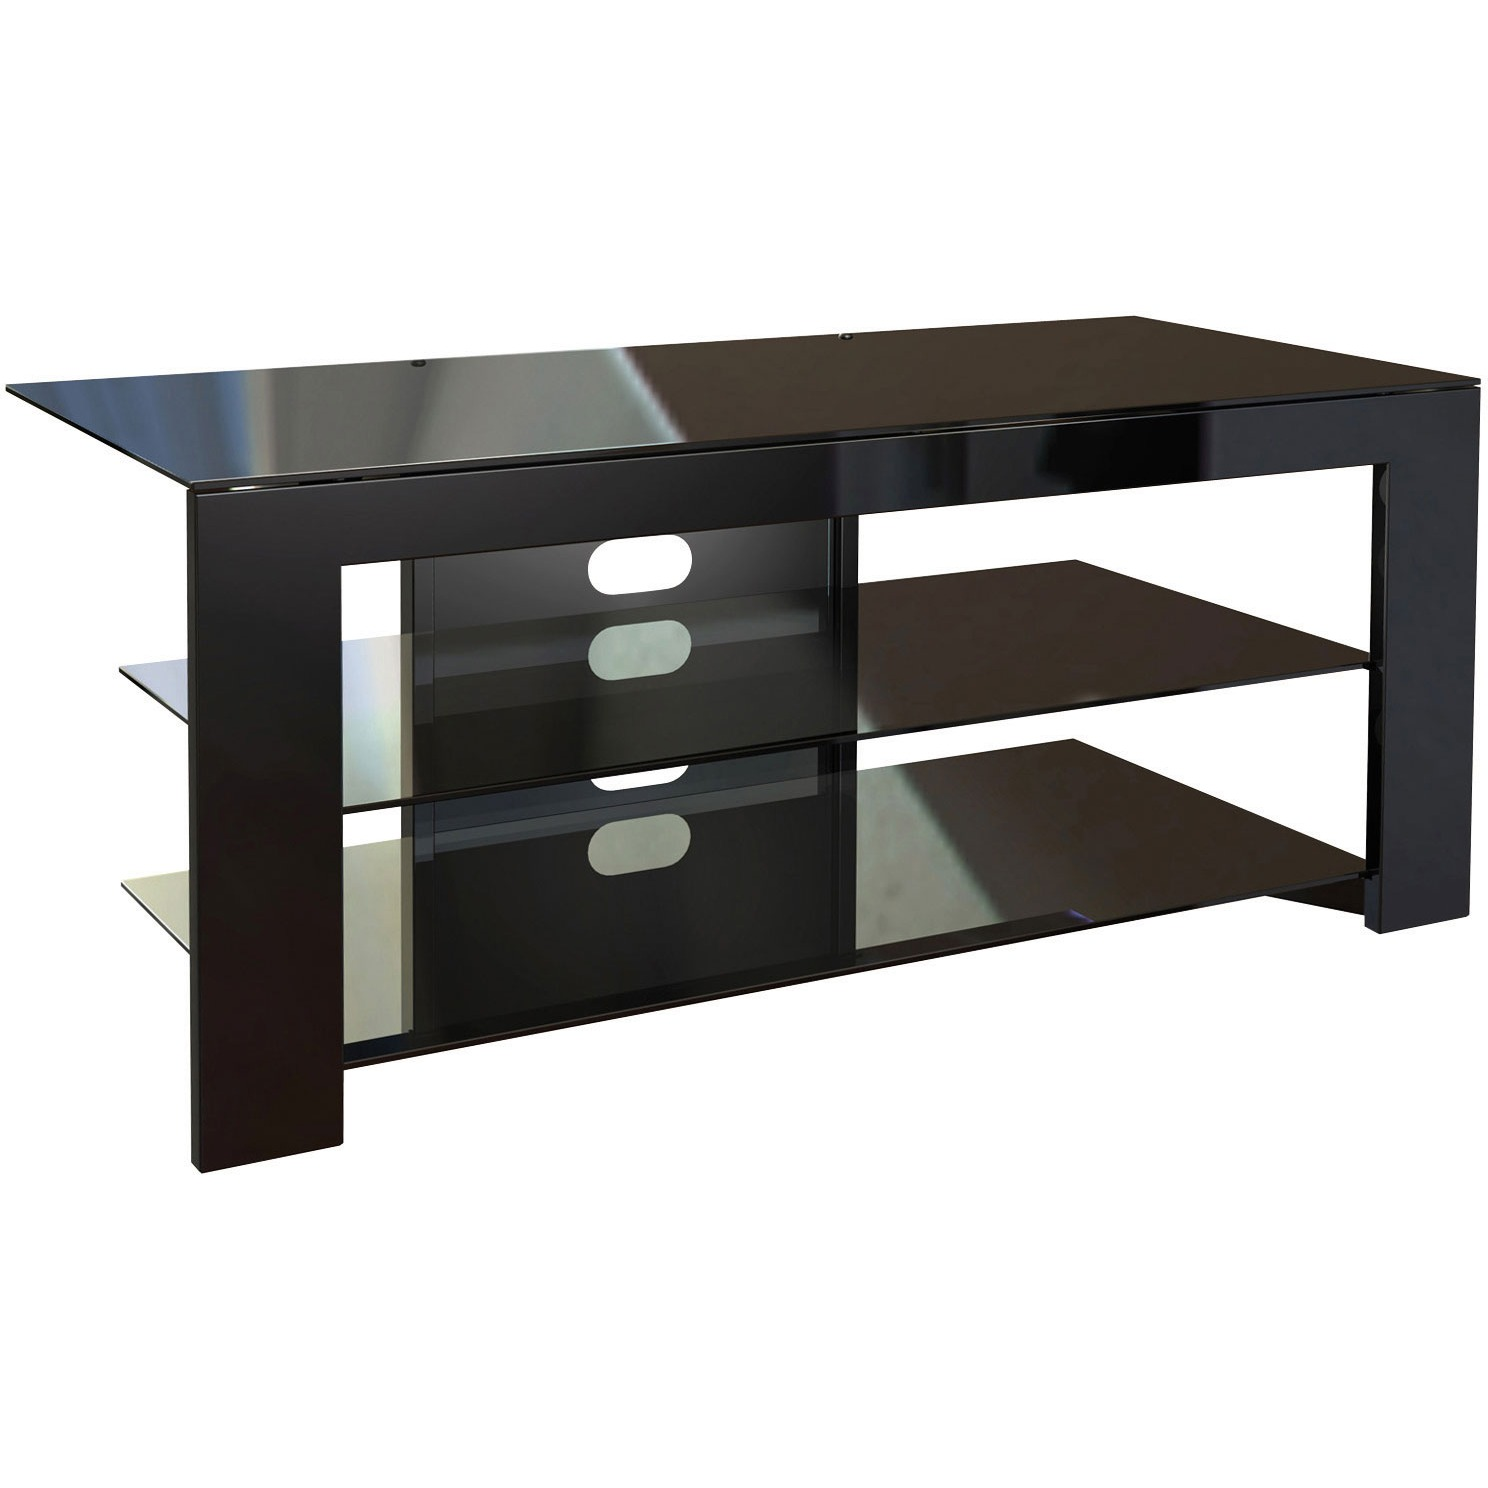 Norstone nelio meuble tv norstone sur for Meuble tv norstone